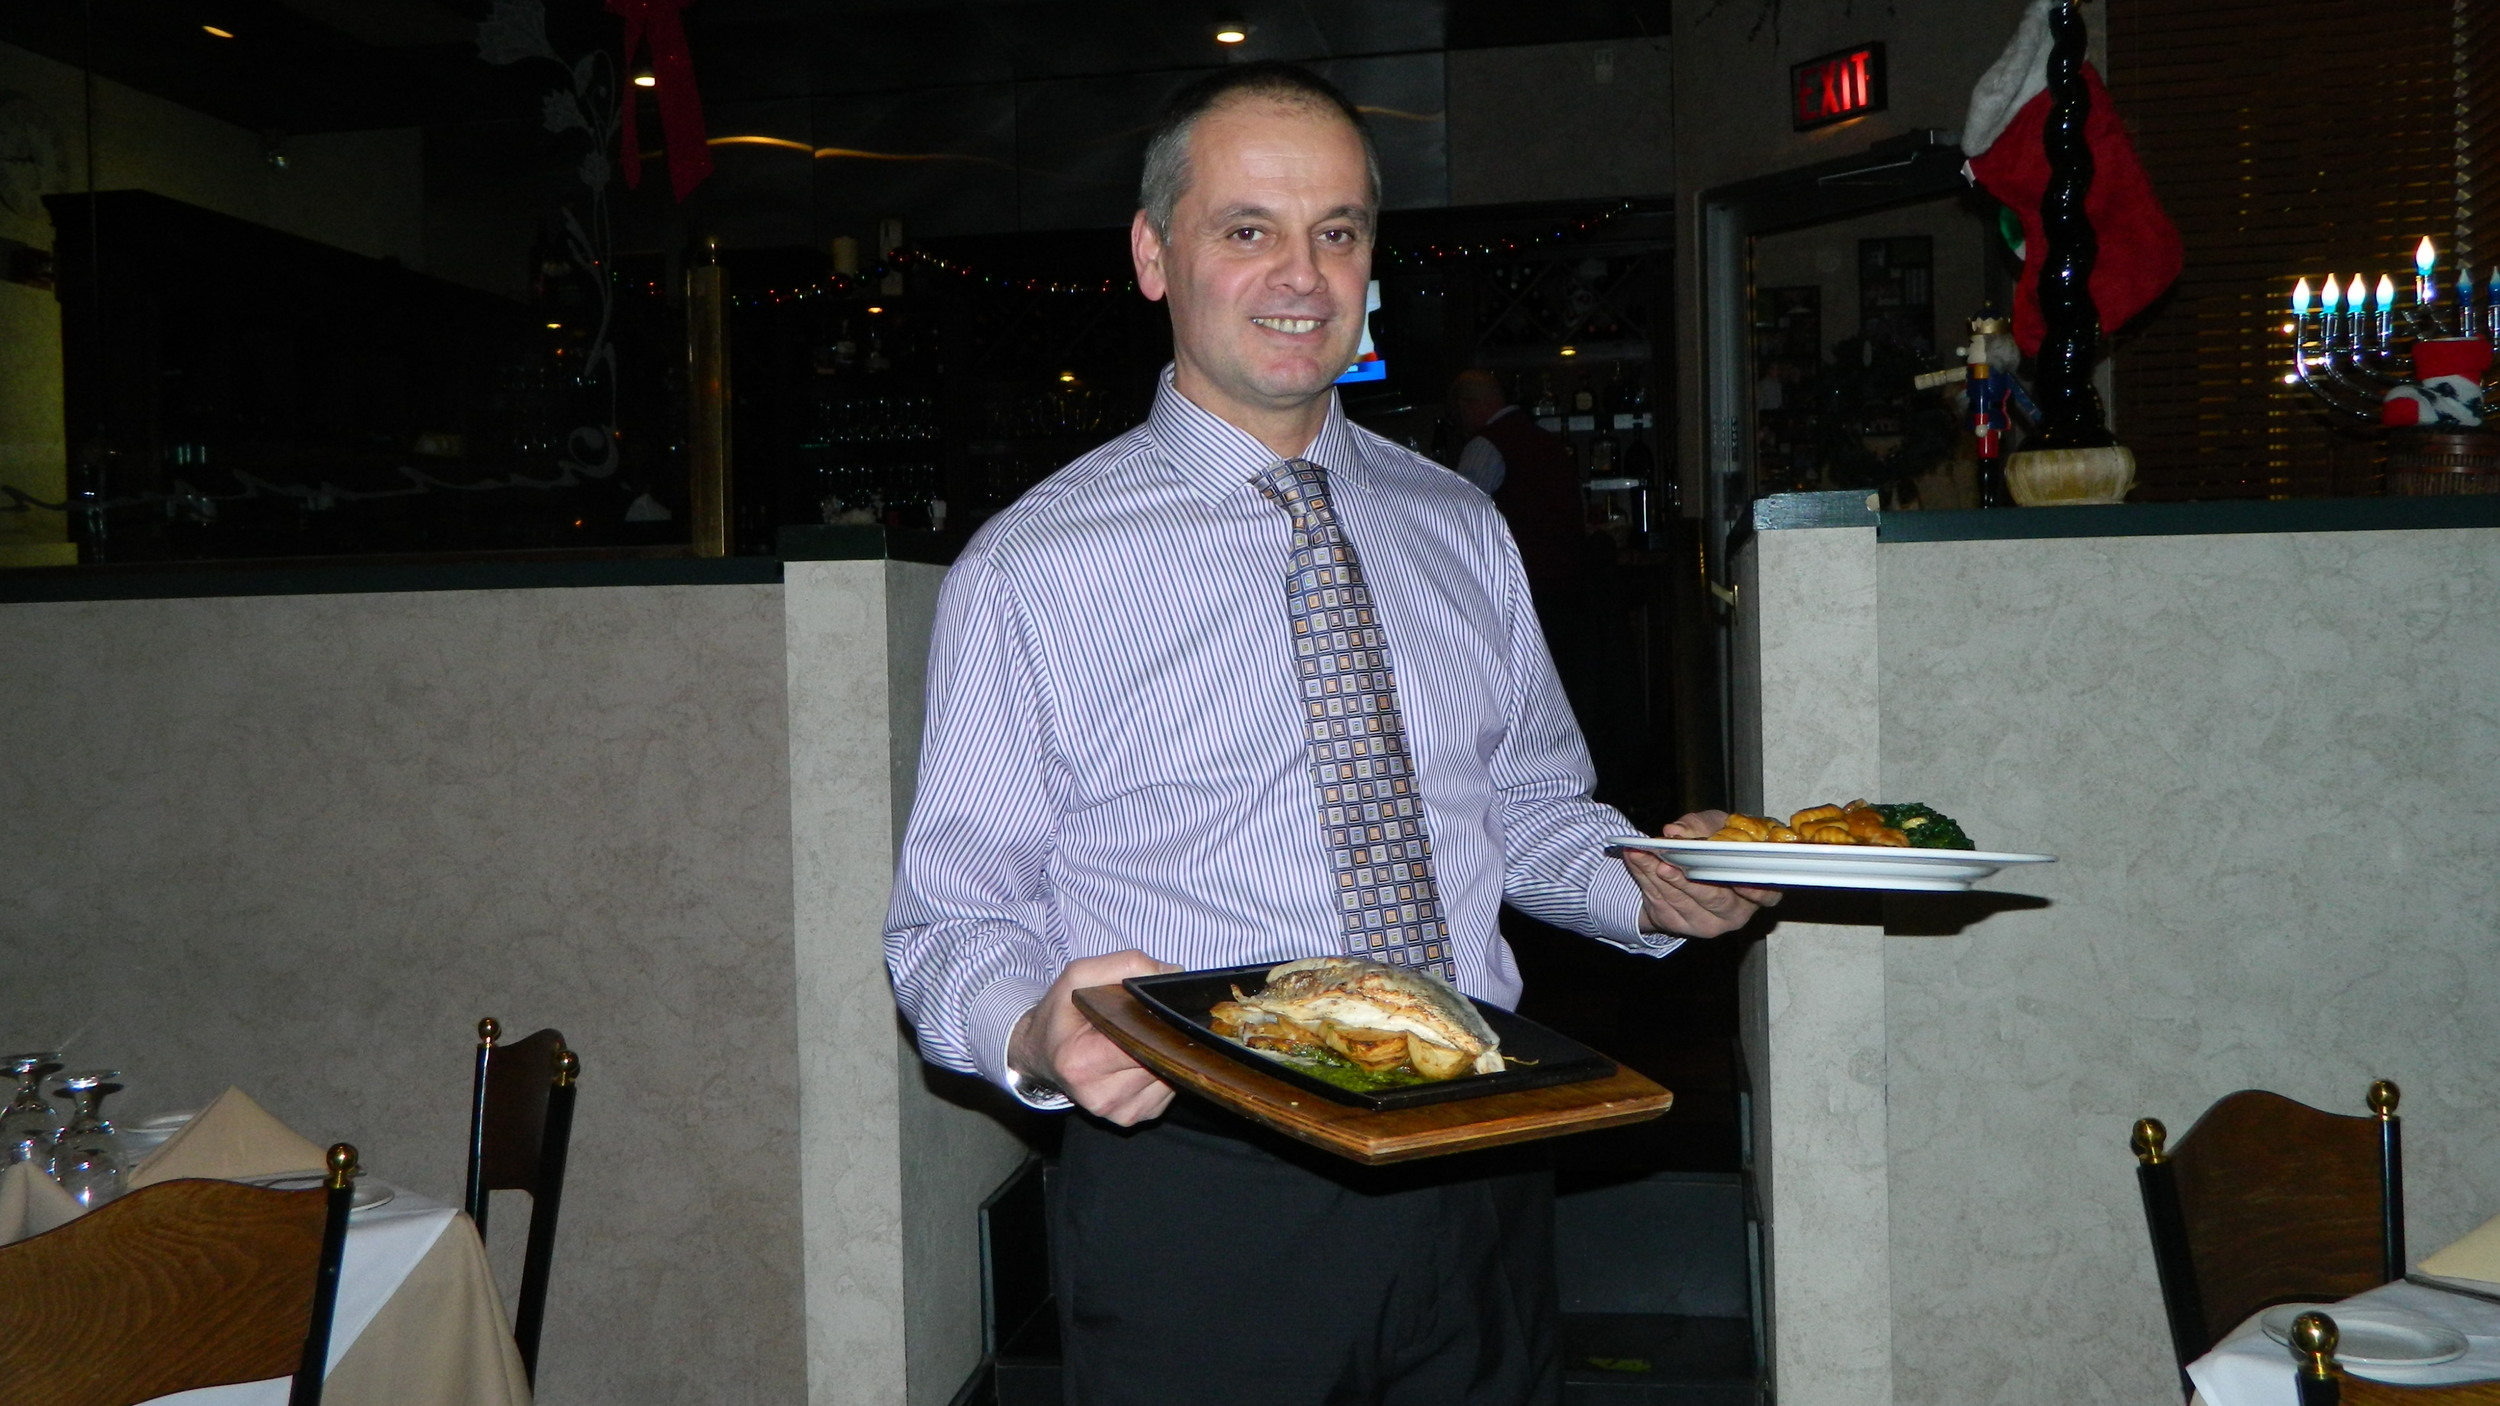 Roland Mizaku presents veal saltimbocca and branzino entrees.